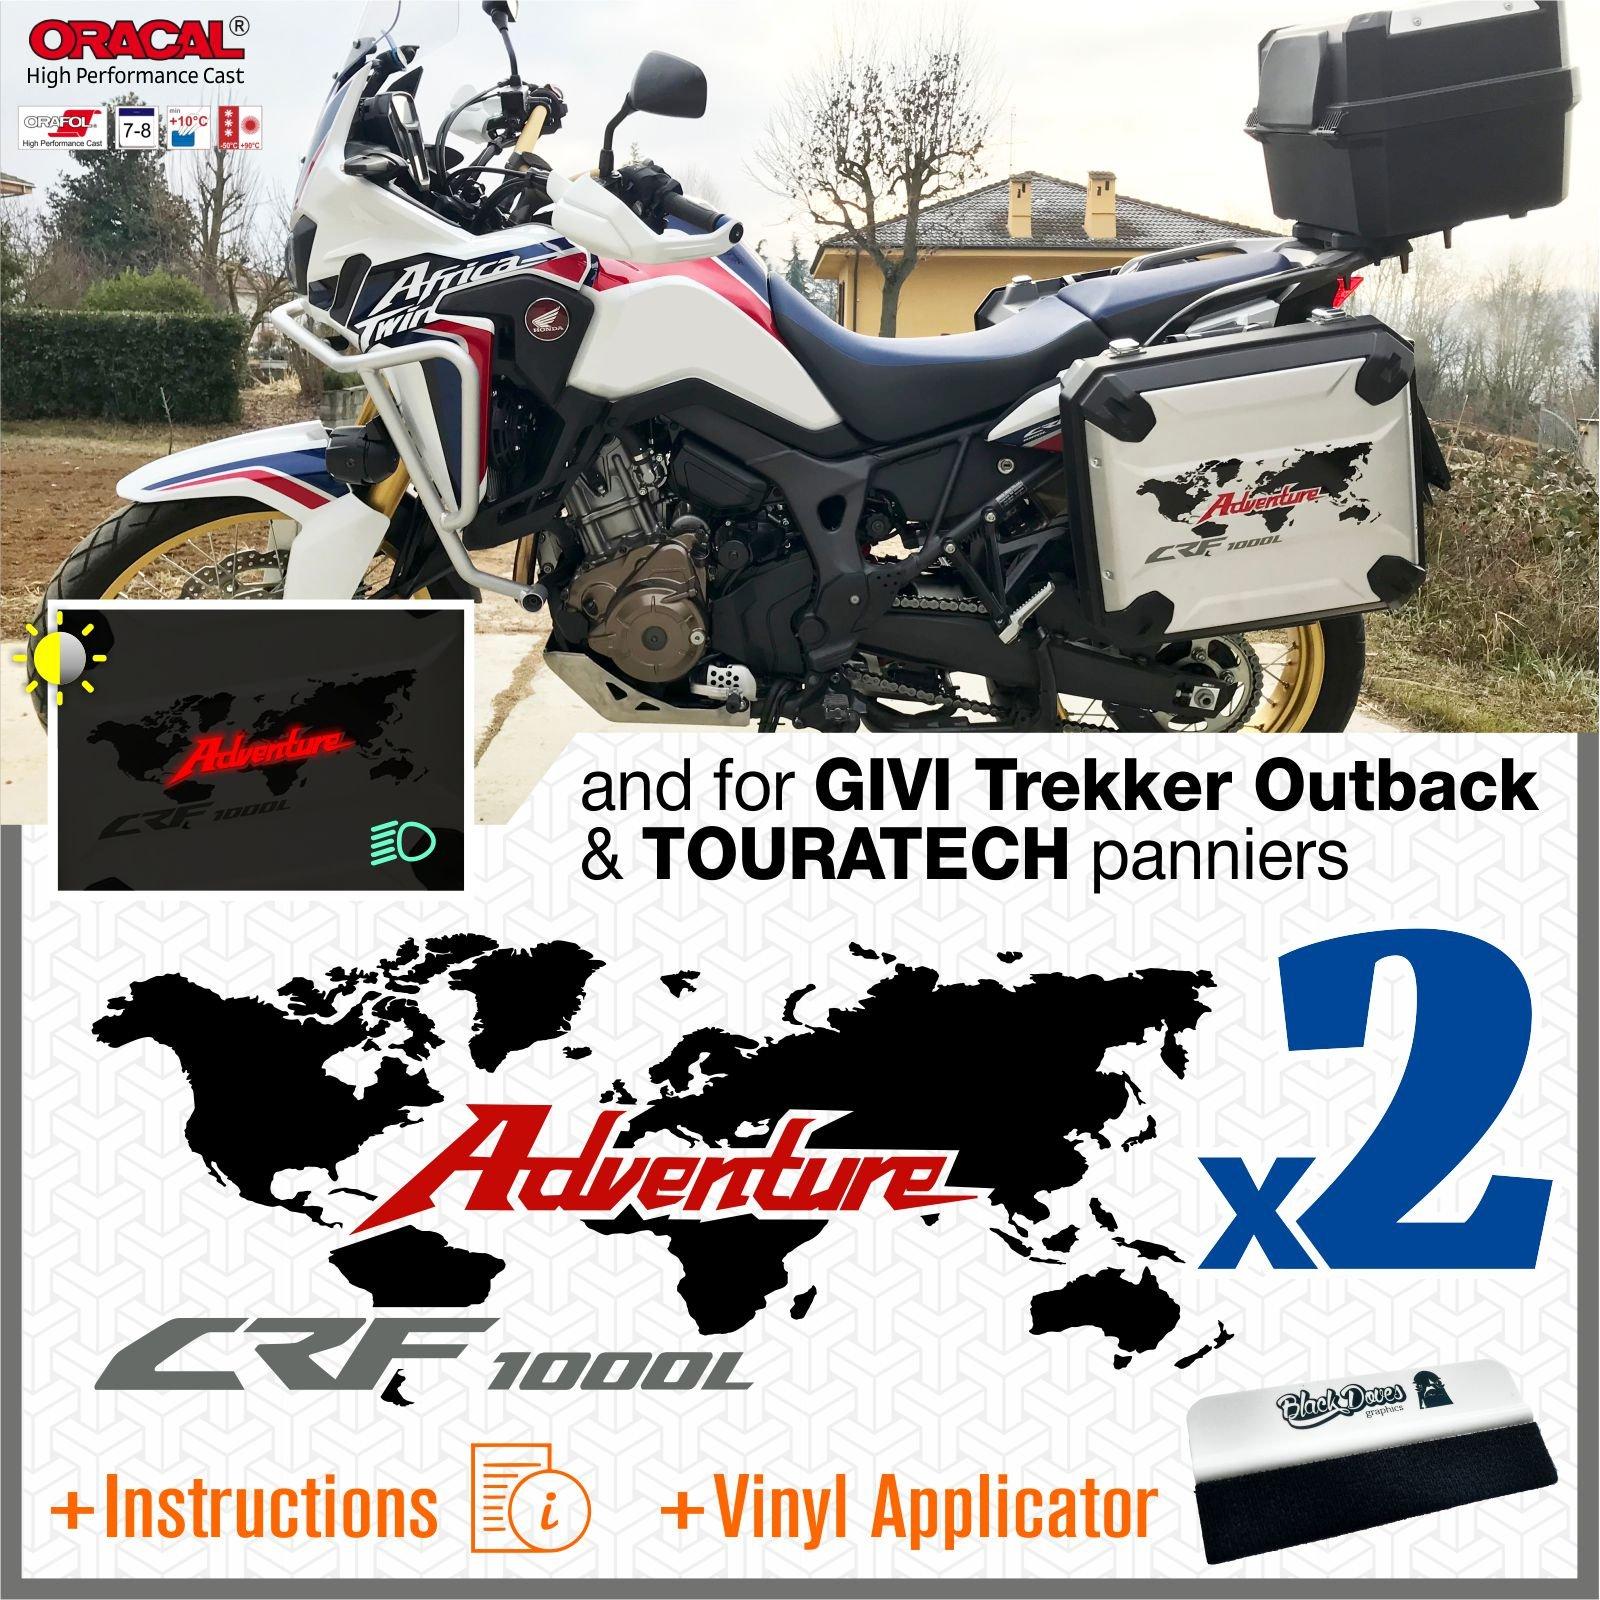 Black KIT 2 STICKER COVERS HONDA AFRICA TWIN CRF1000L VHA-001